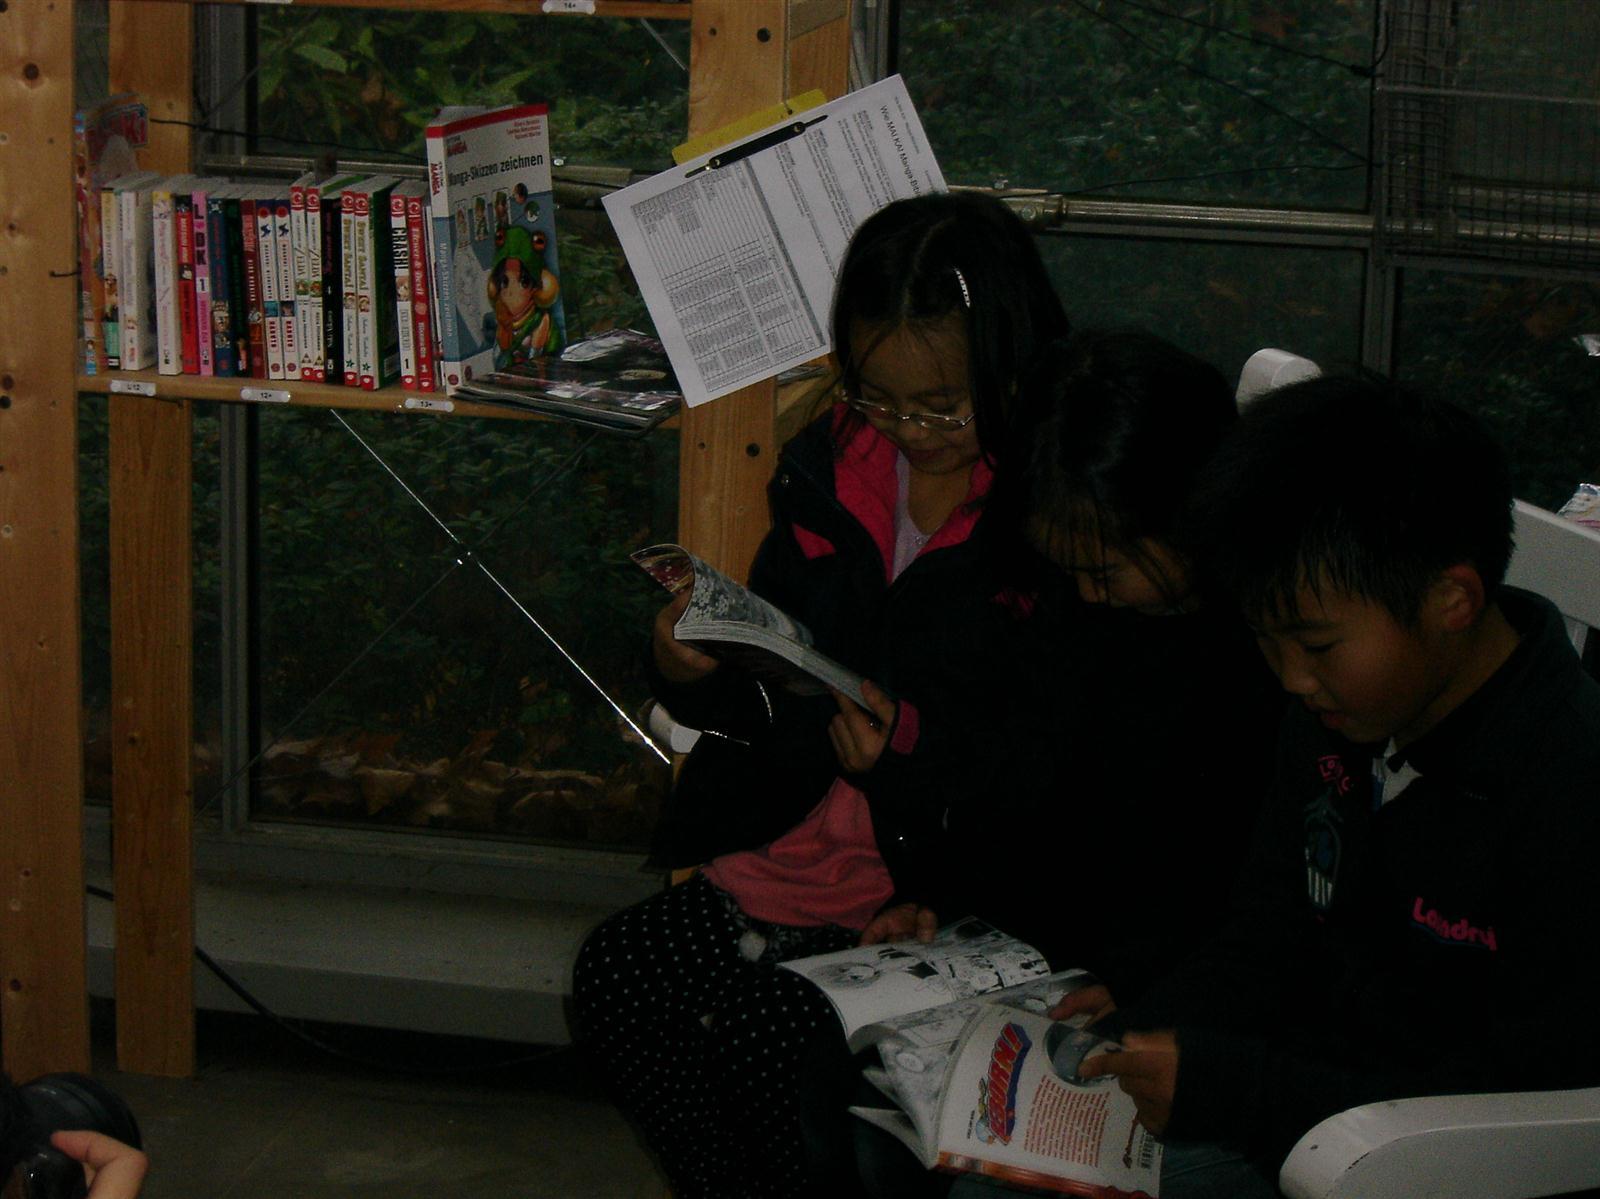 Japan_Week_2011_Wie.MAI.KAI_Leseecke_Palmengarten_wmk_058